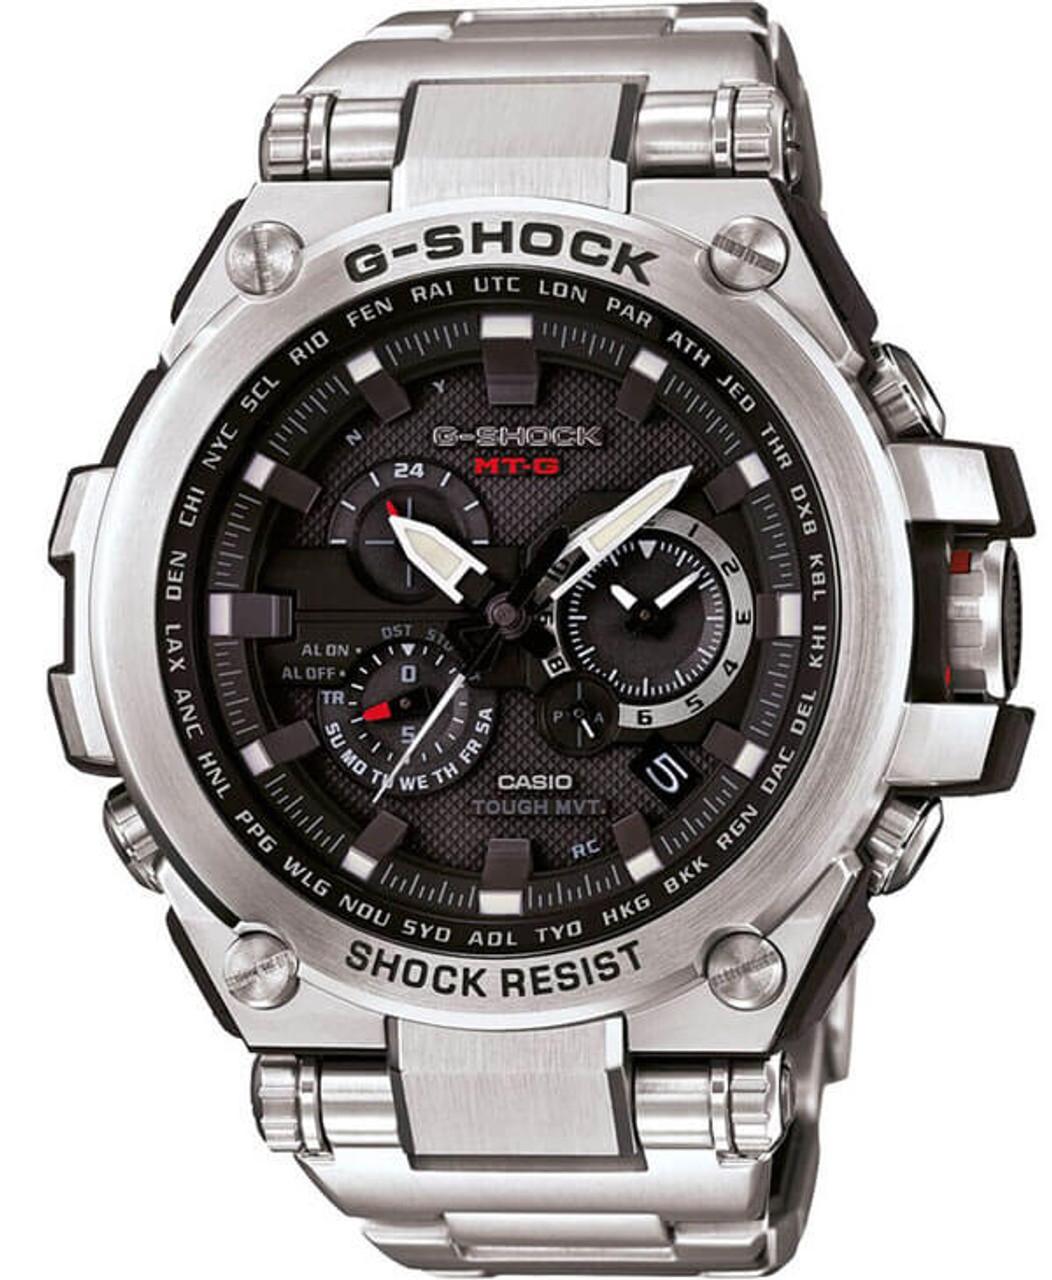 Casio G-Shock MTG-S1000D-1AJF Multiband 6